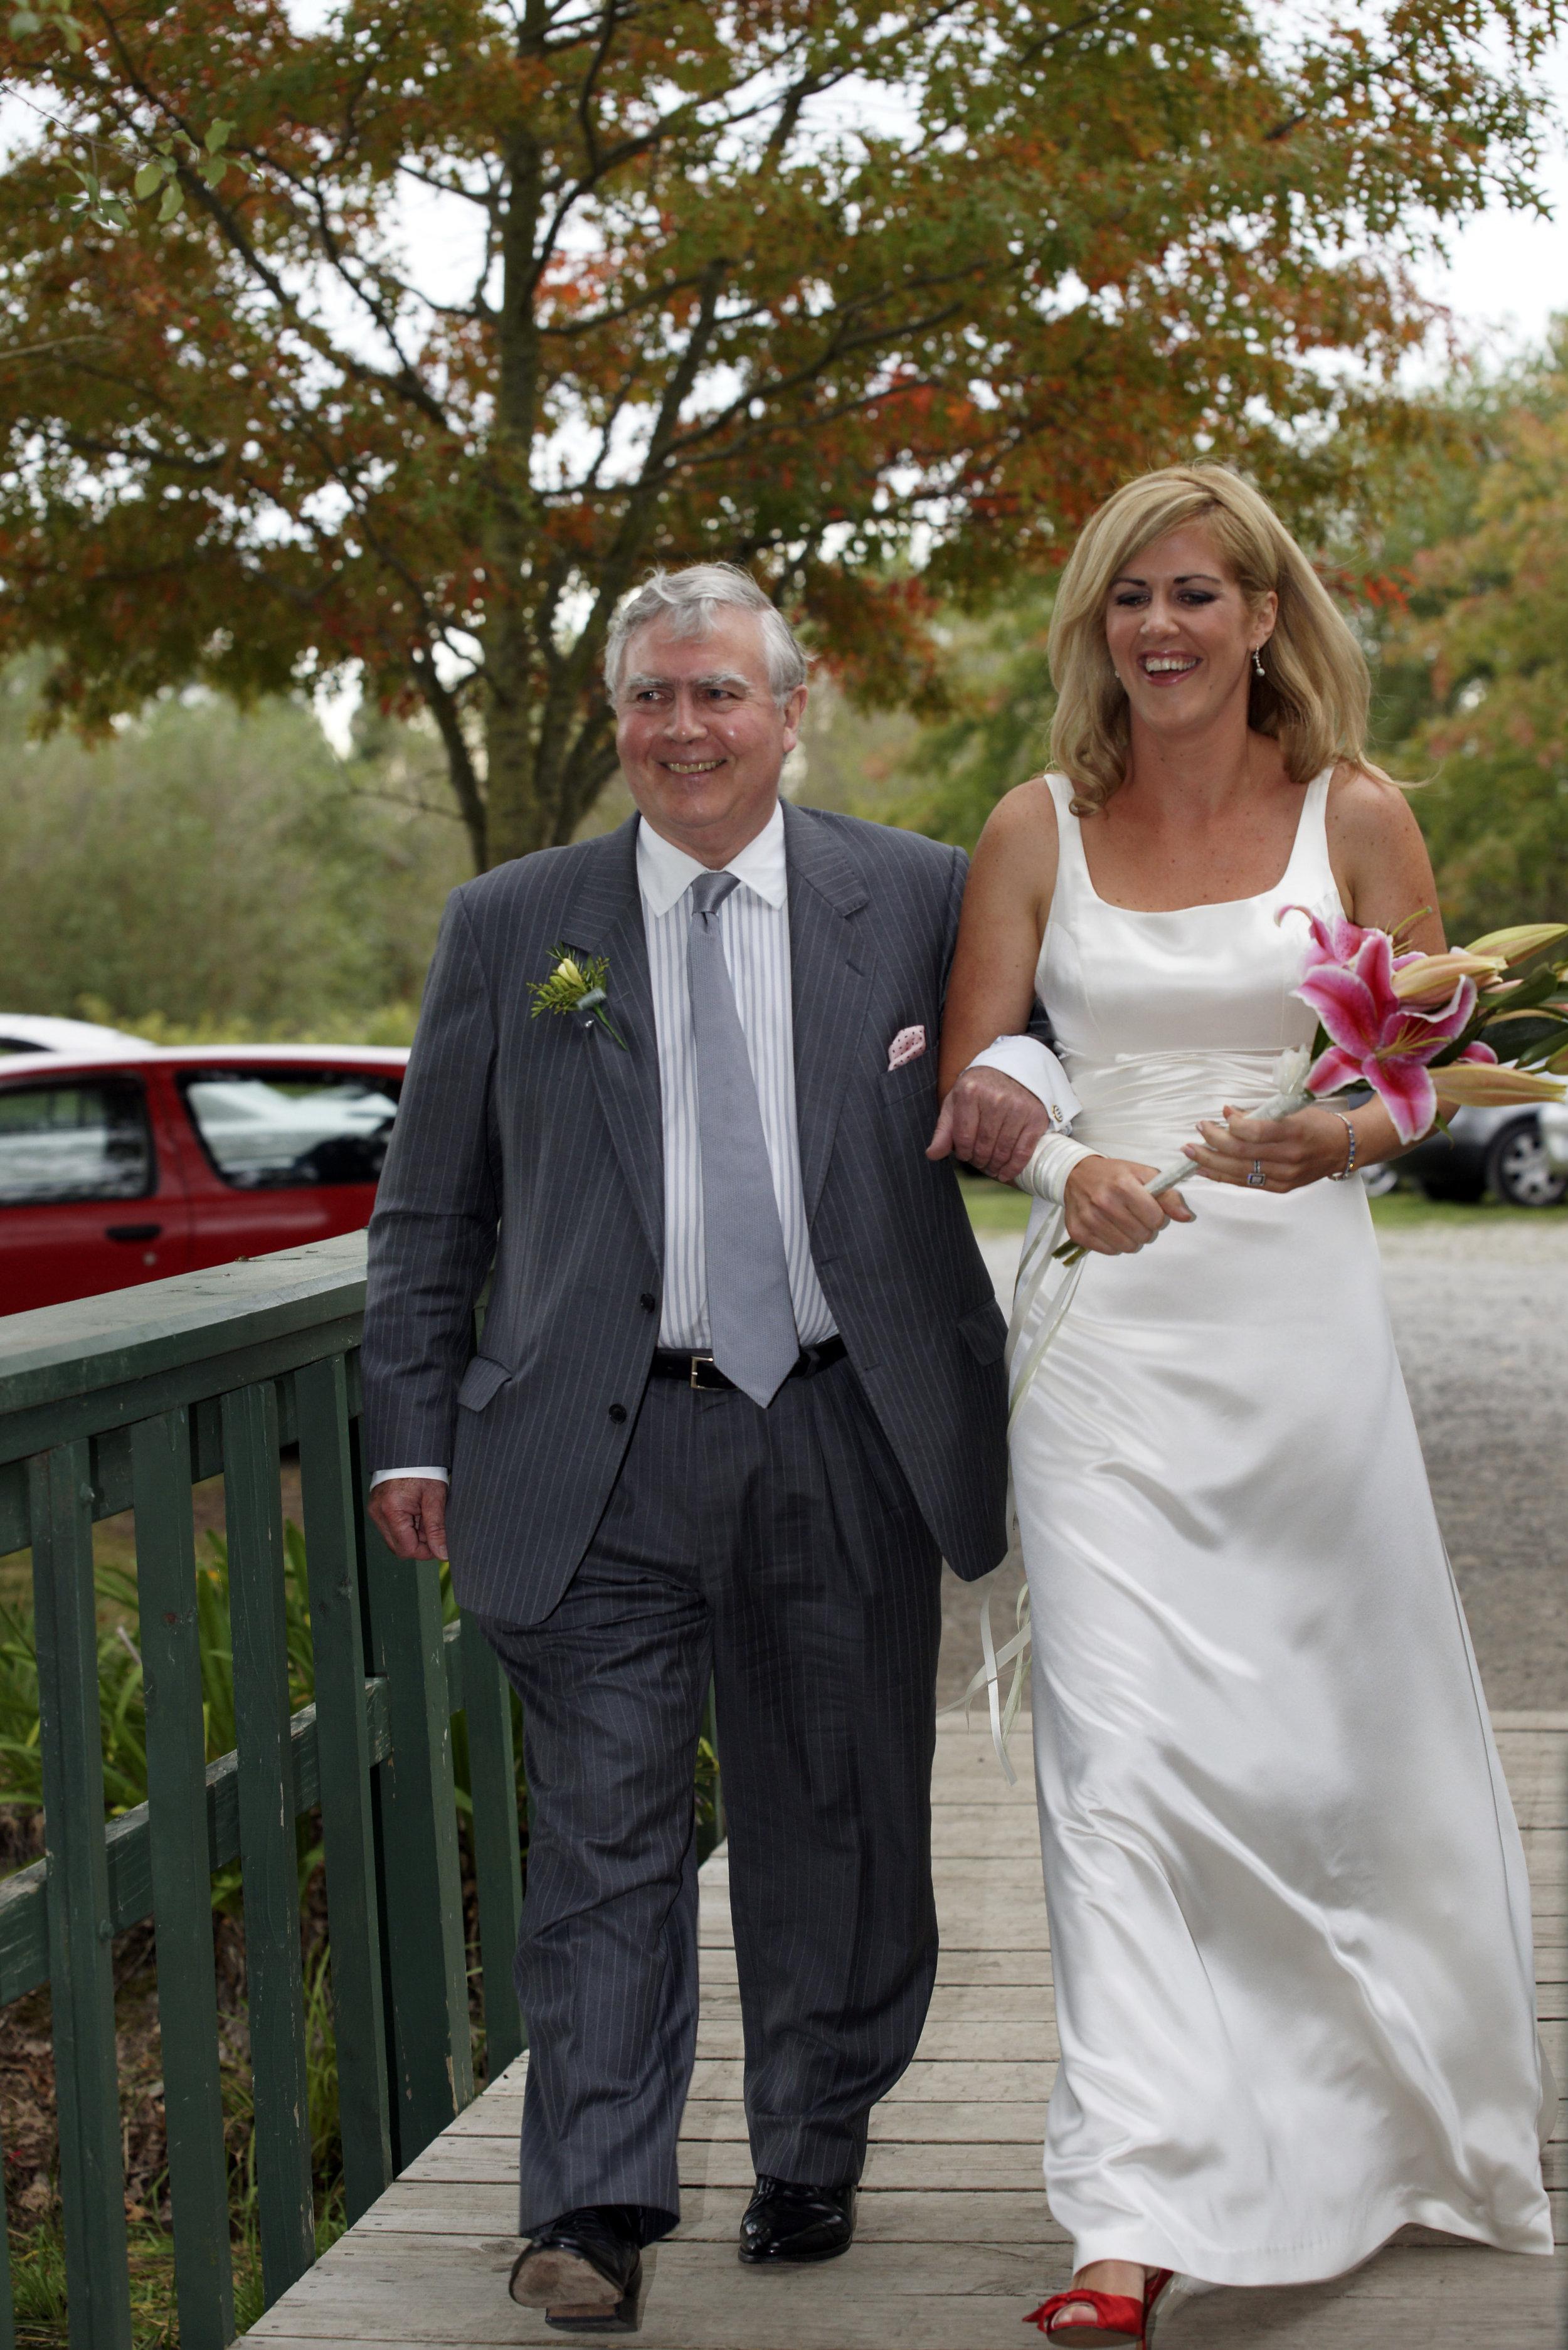 Juliet - silk satin crepe, ribbons - Christchurch bride - friend photographer